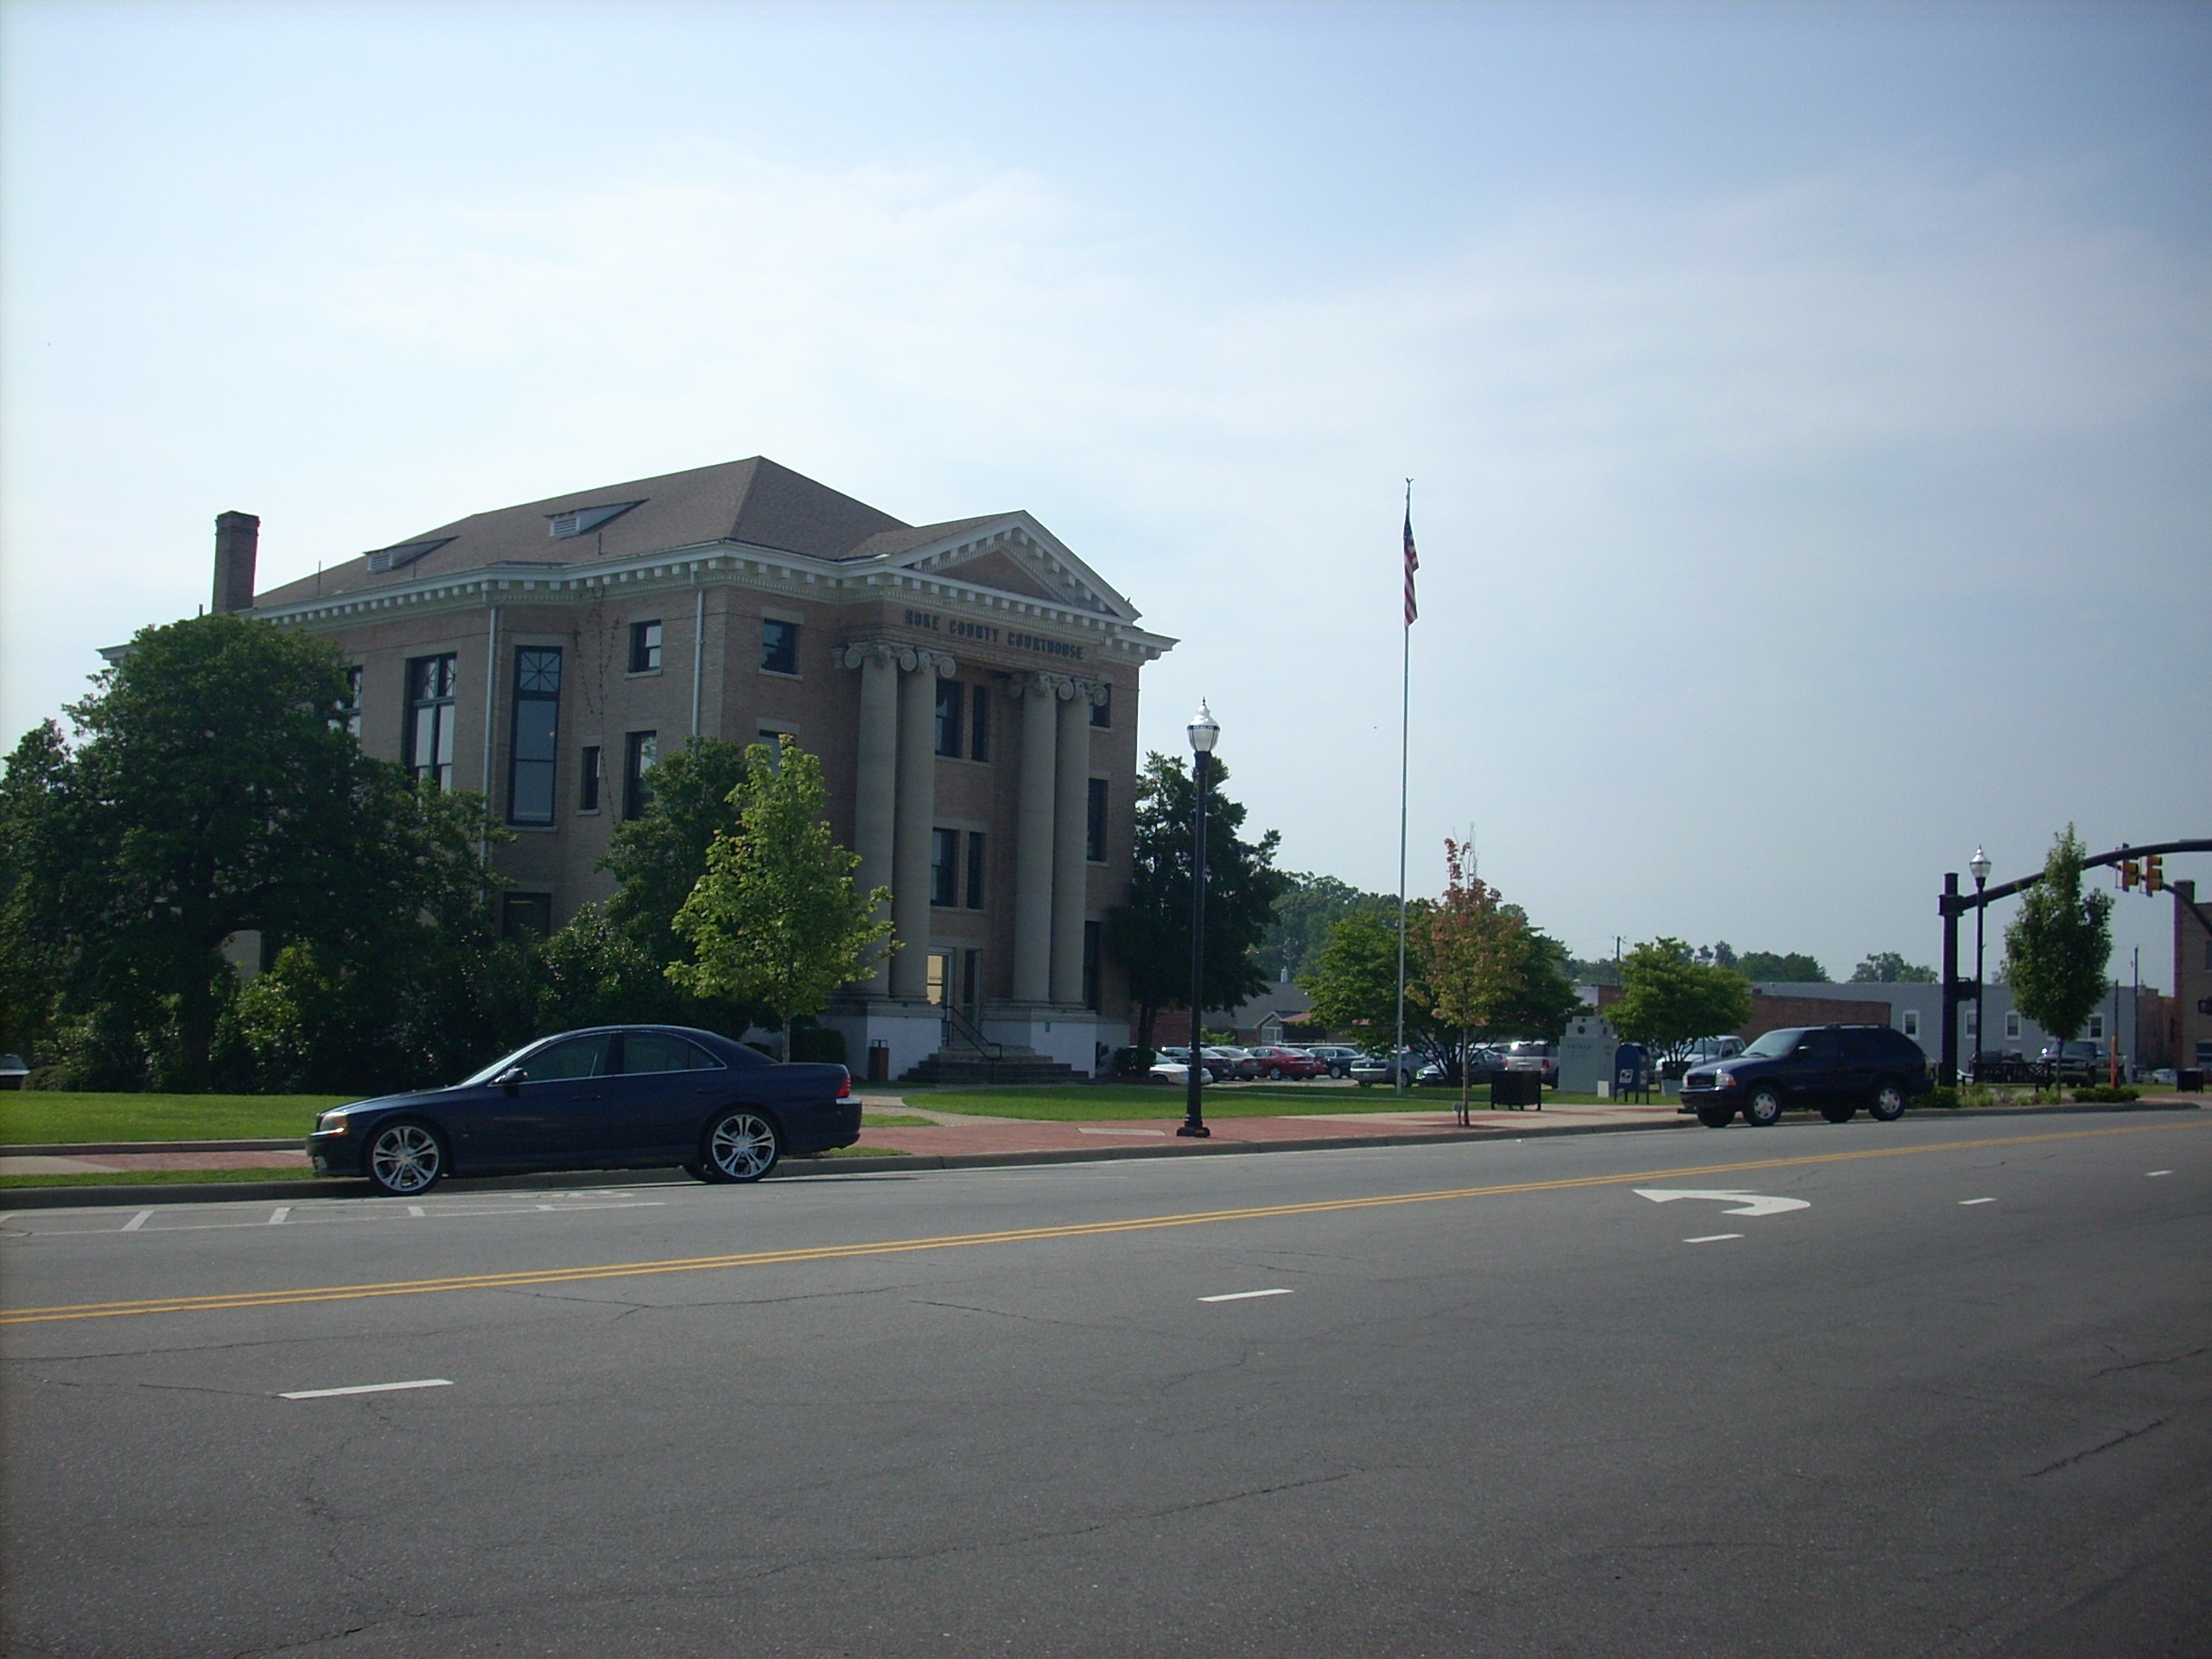 File:Hoke County Courthouse.JPG - Wikipedia, the free encyclopediabalance of hoke county